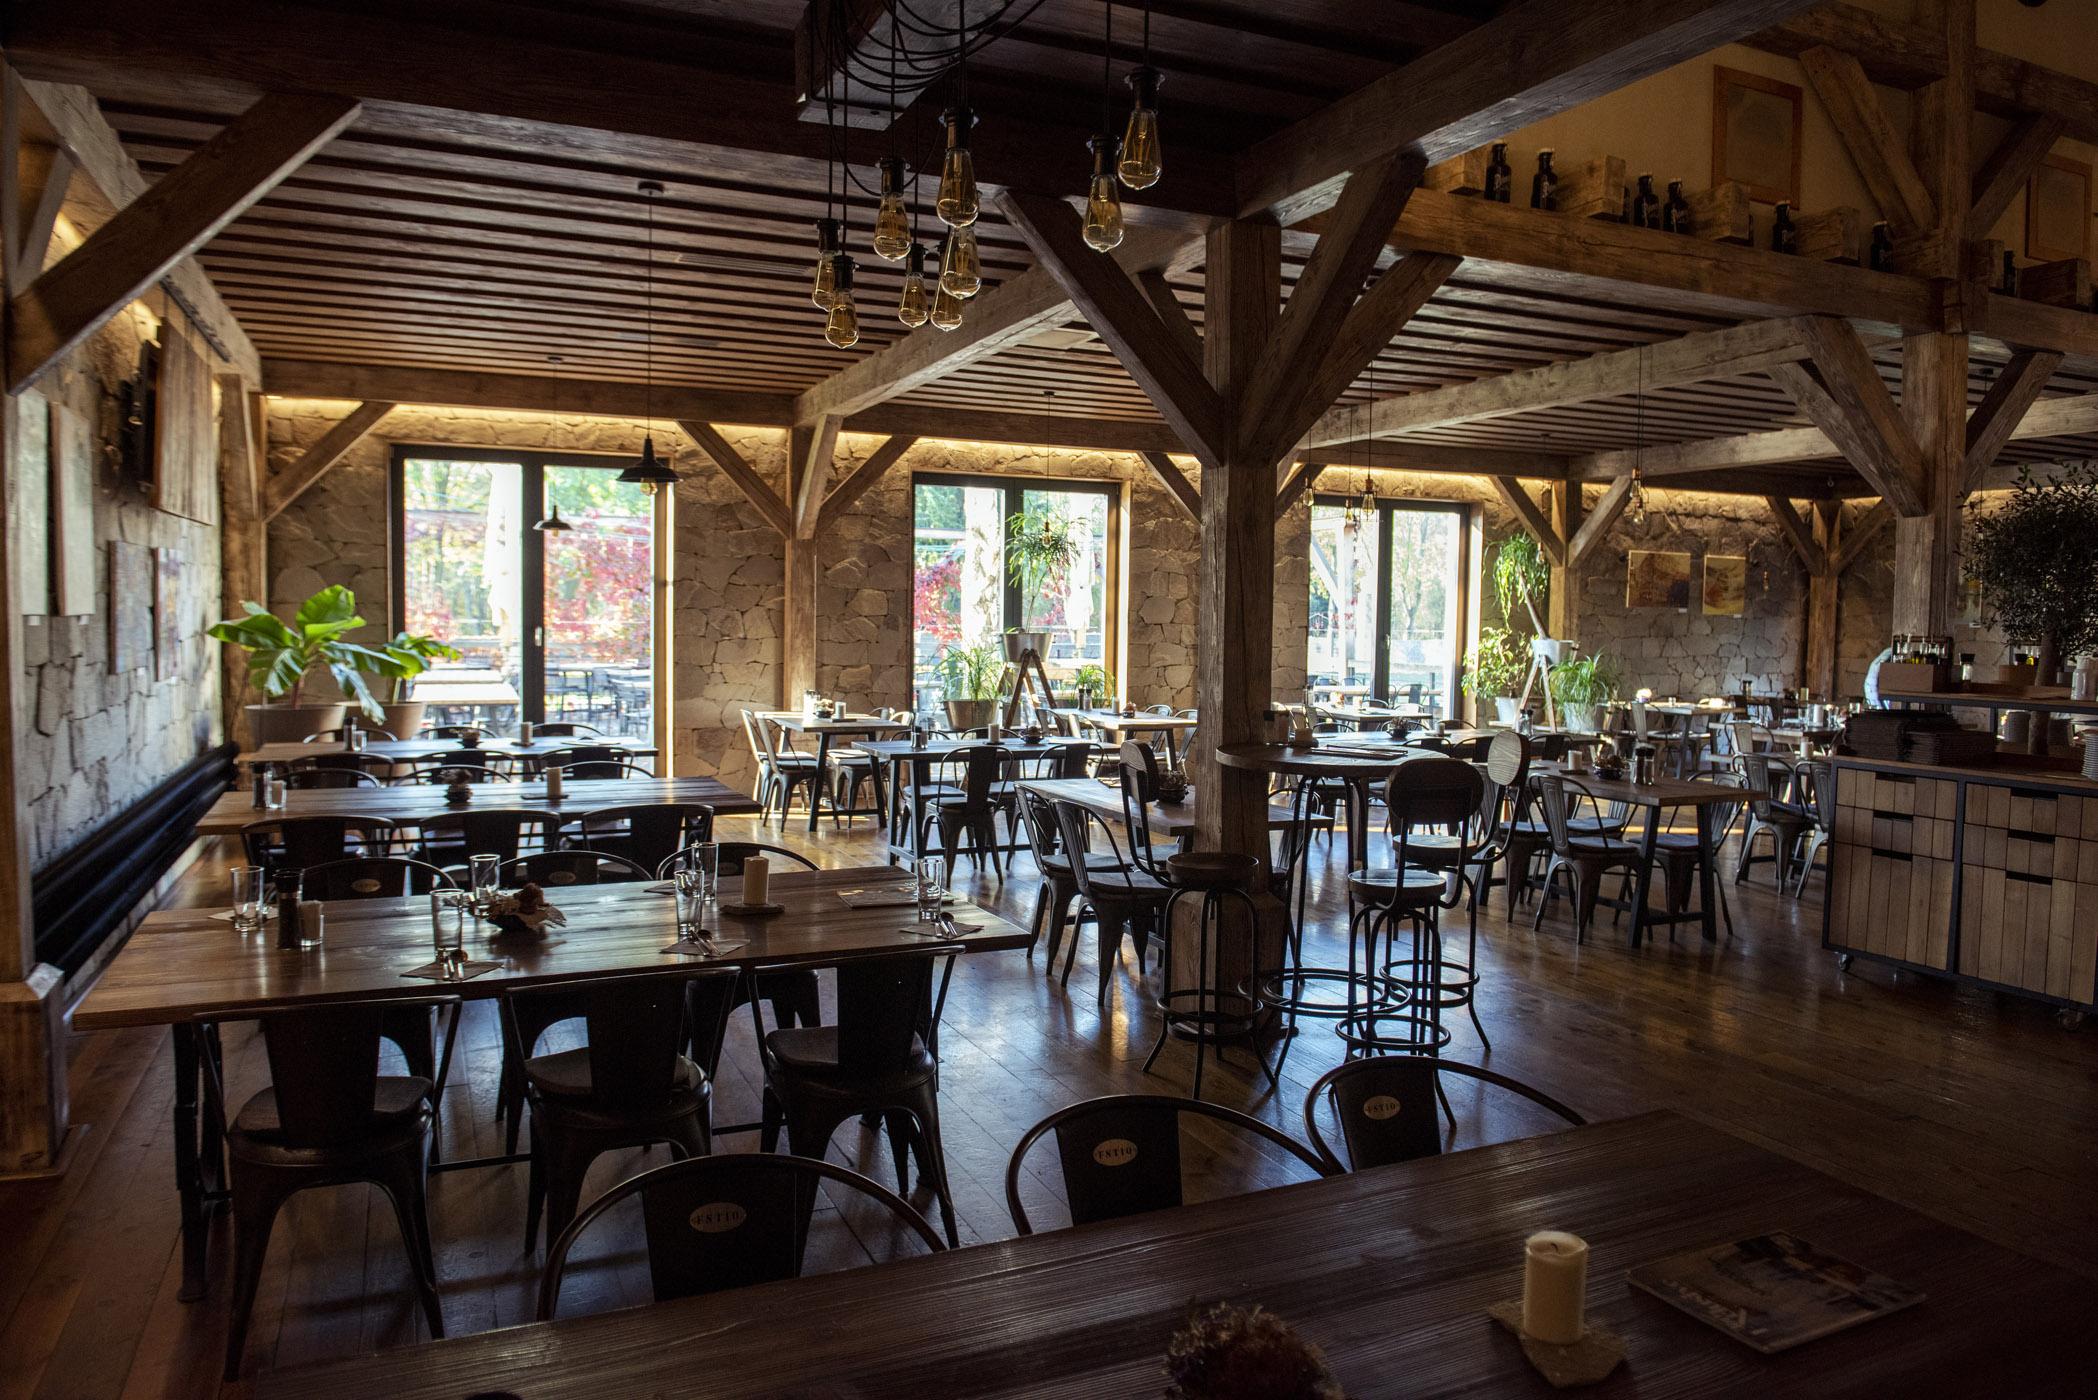 Reštaurácia Meridiana, Bojnice